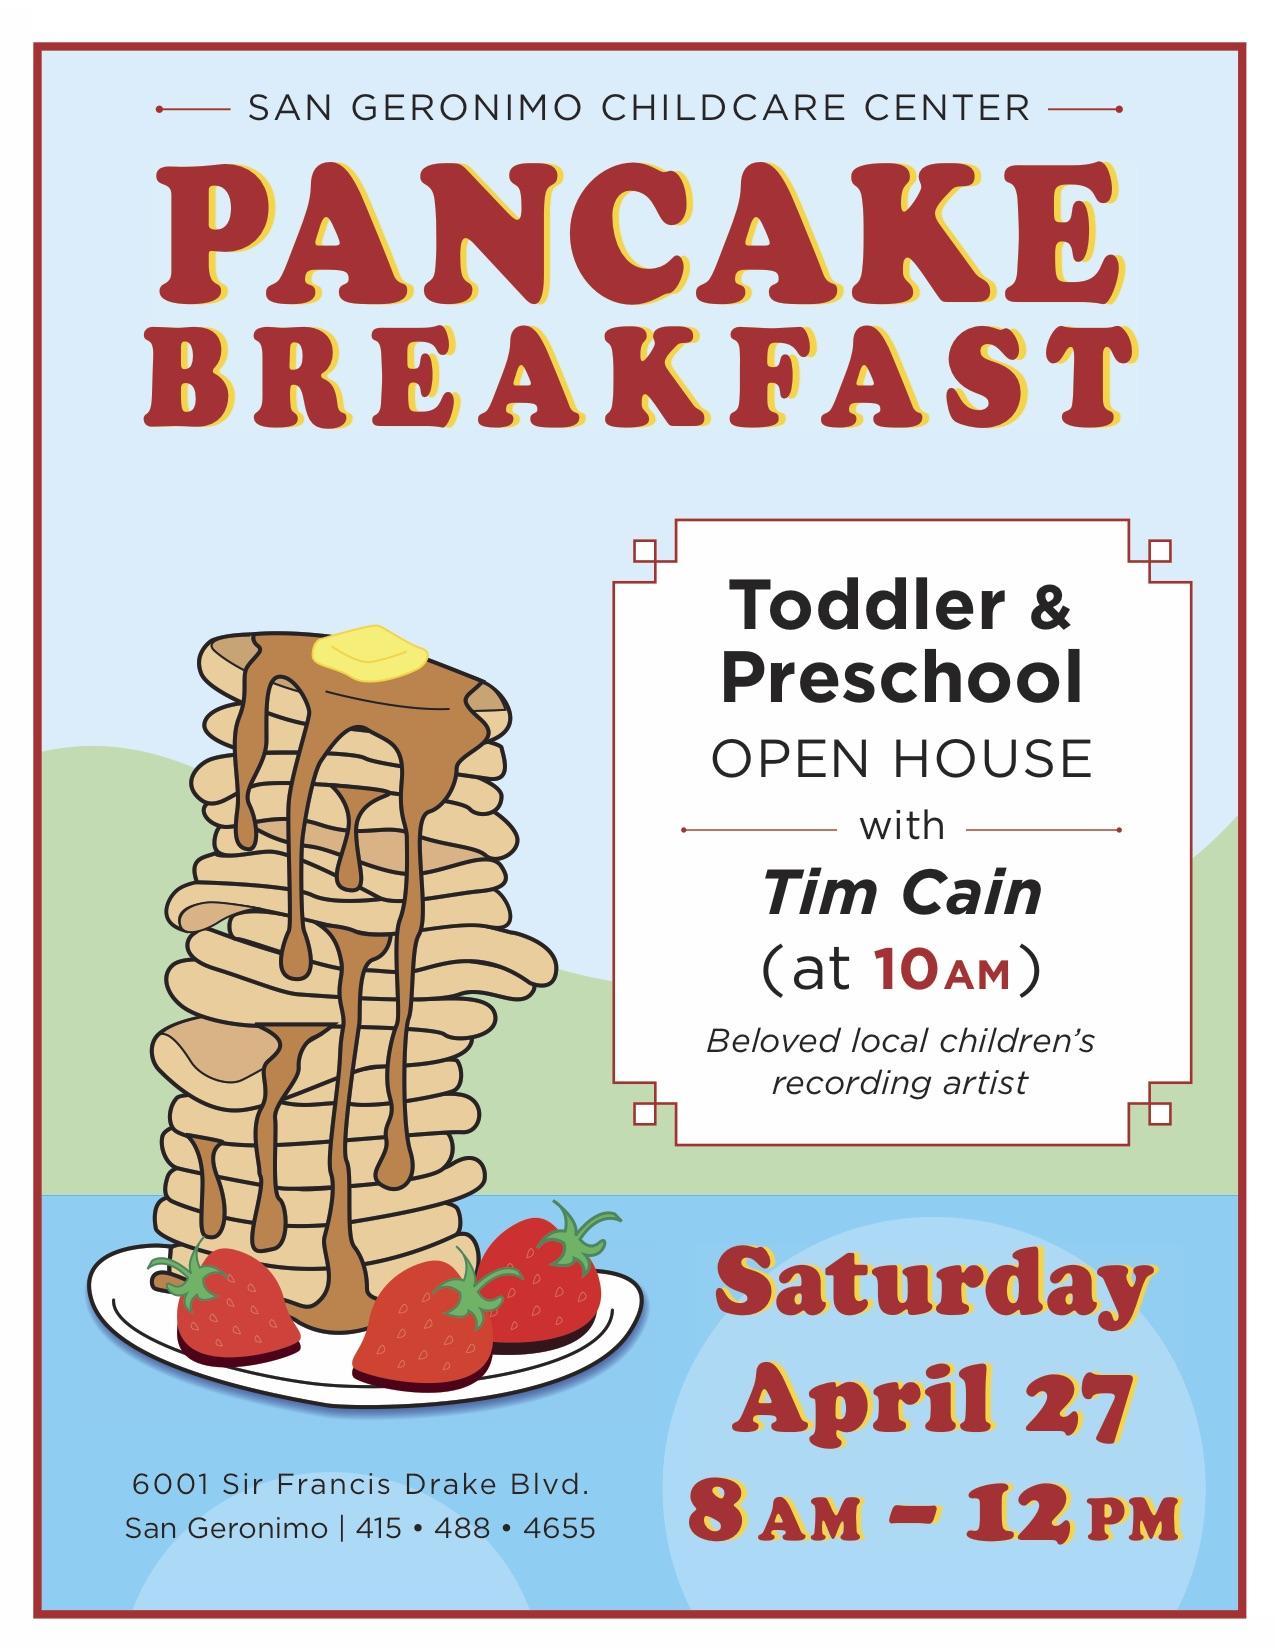 2019 Pancake Flyer - Todd & Pre.jpg